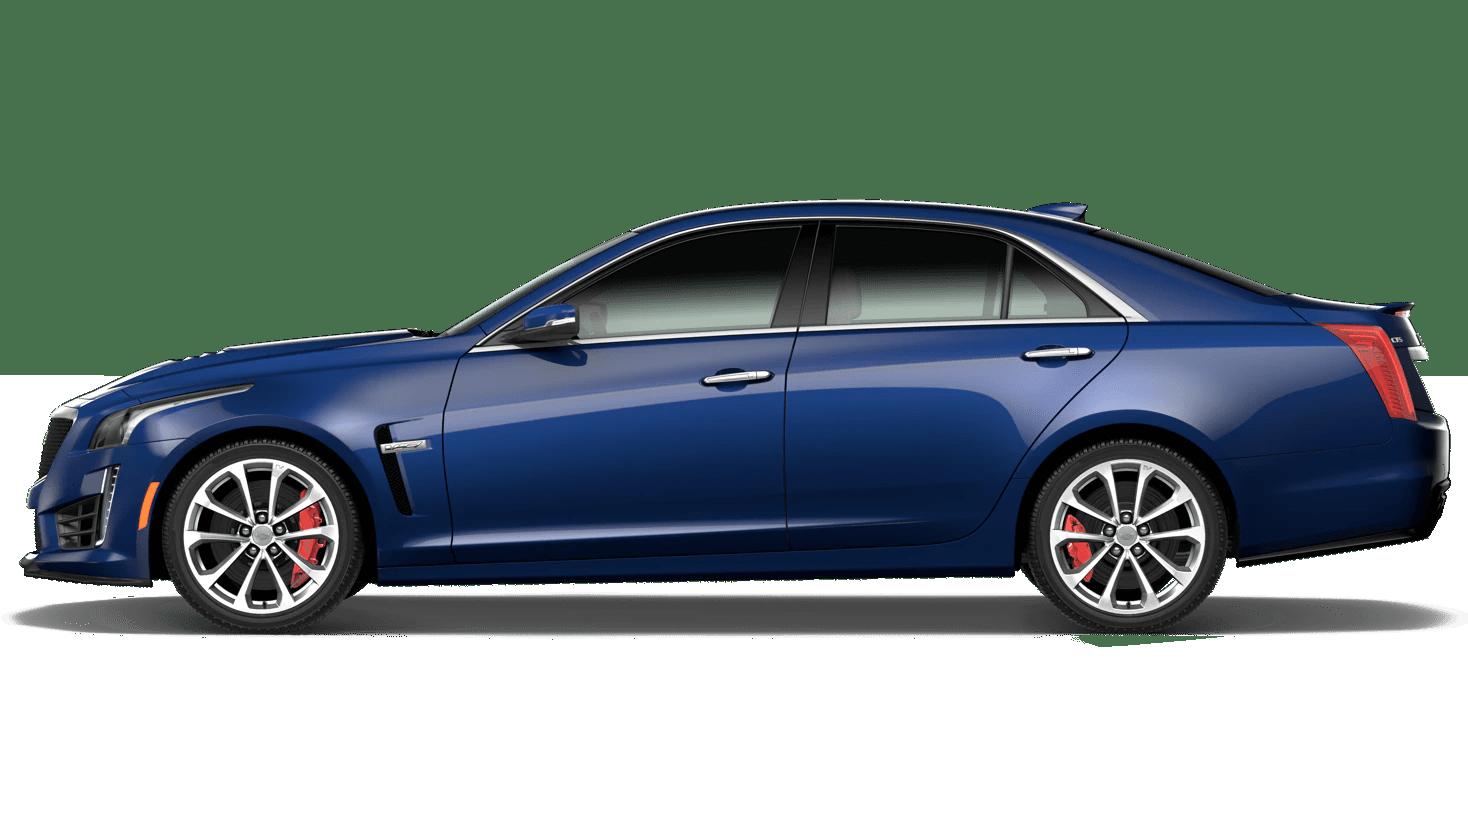 2019 cts v sedan side view [ 1268 x 710 Pixel ]